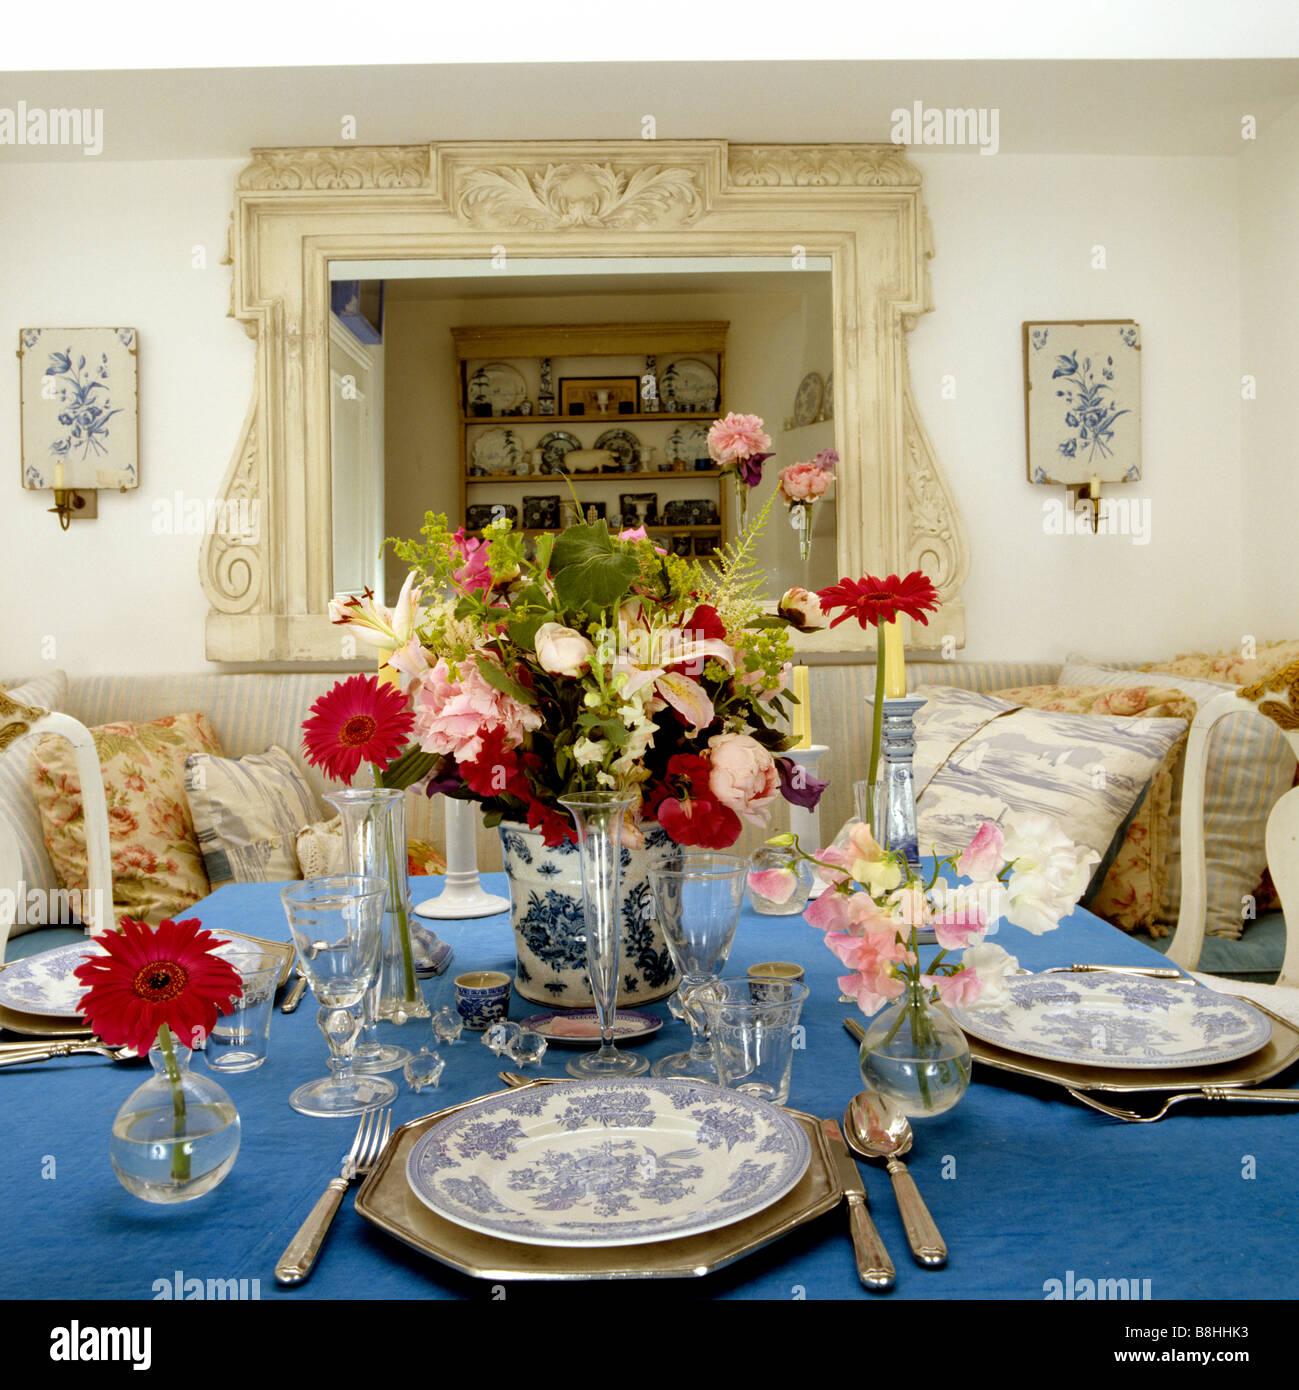 tablecloth stockfotos tablecloth bilder alamy. Black Bedroom Furniture Sets. Home Design Ideas